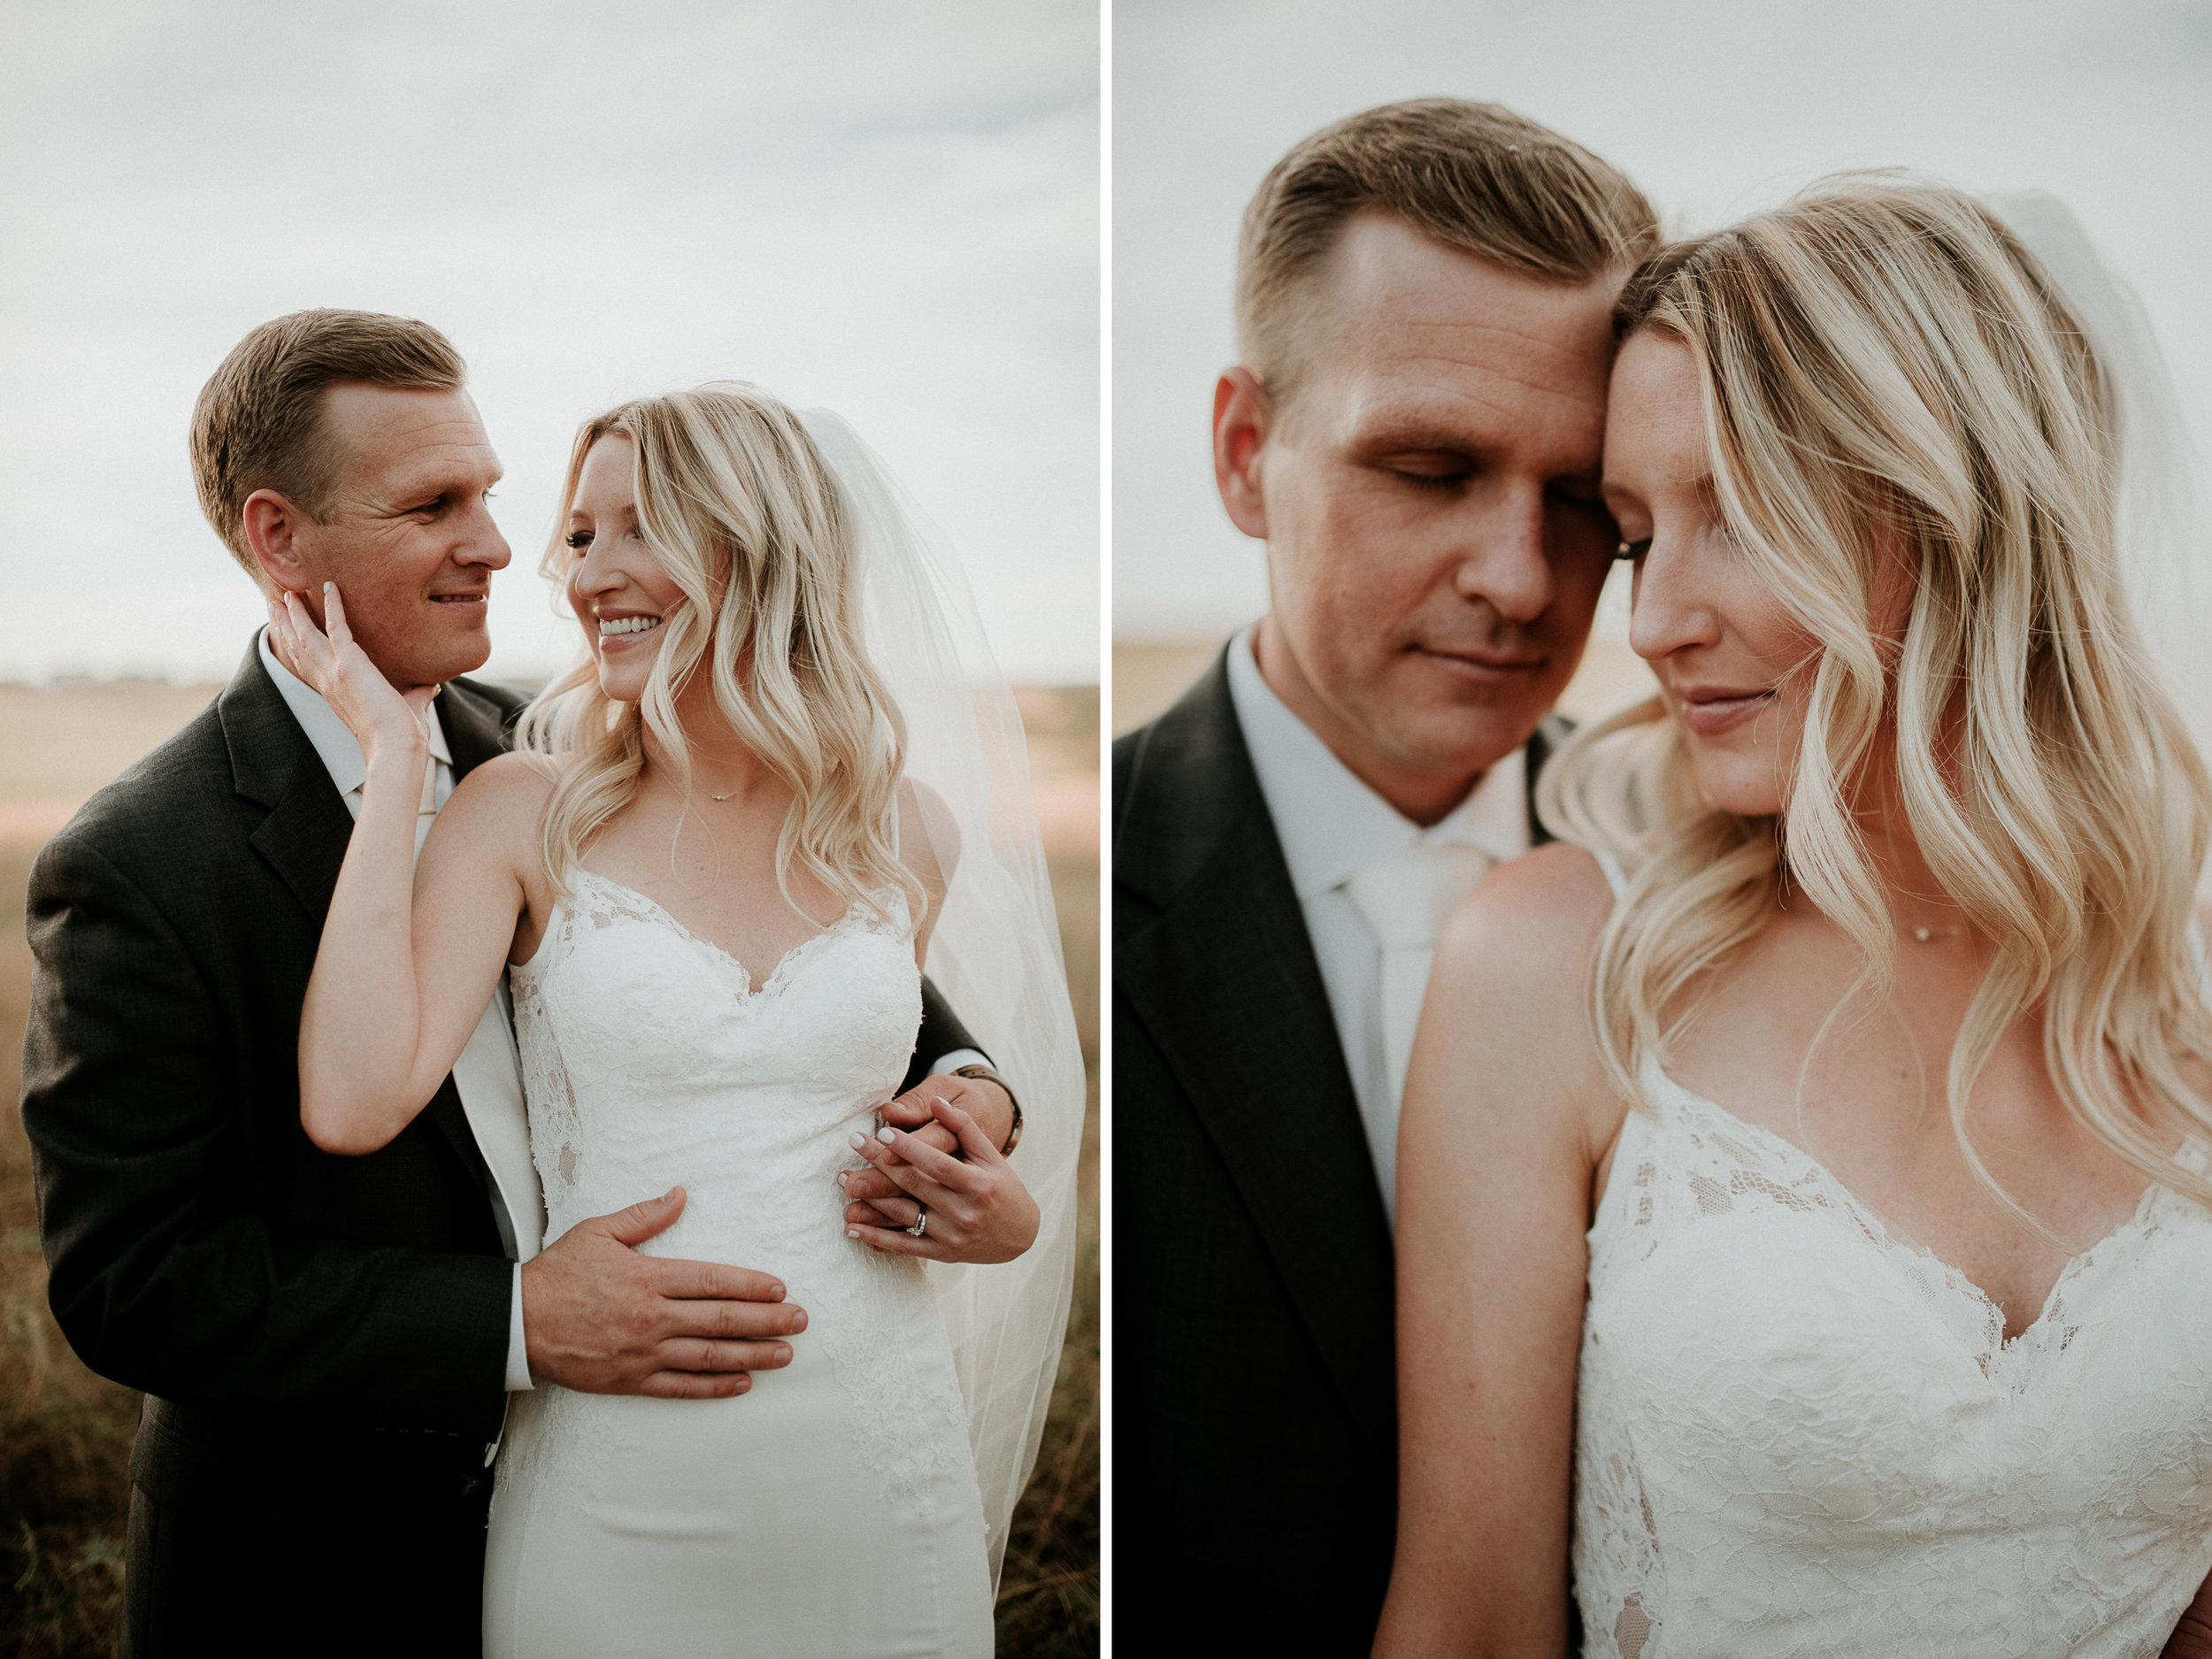 Zach&Rosalie St. Louis Wedding Photographer 5.jpg